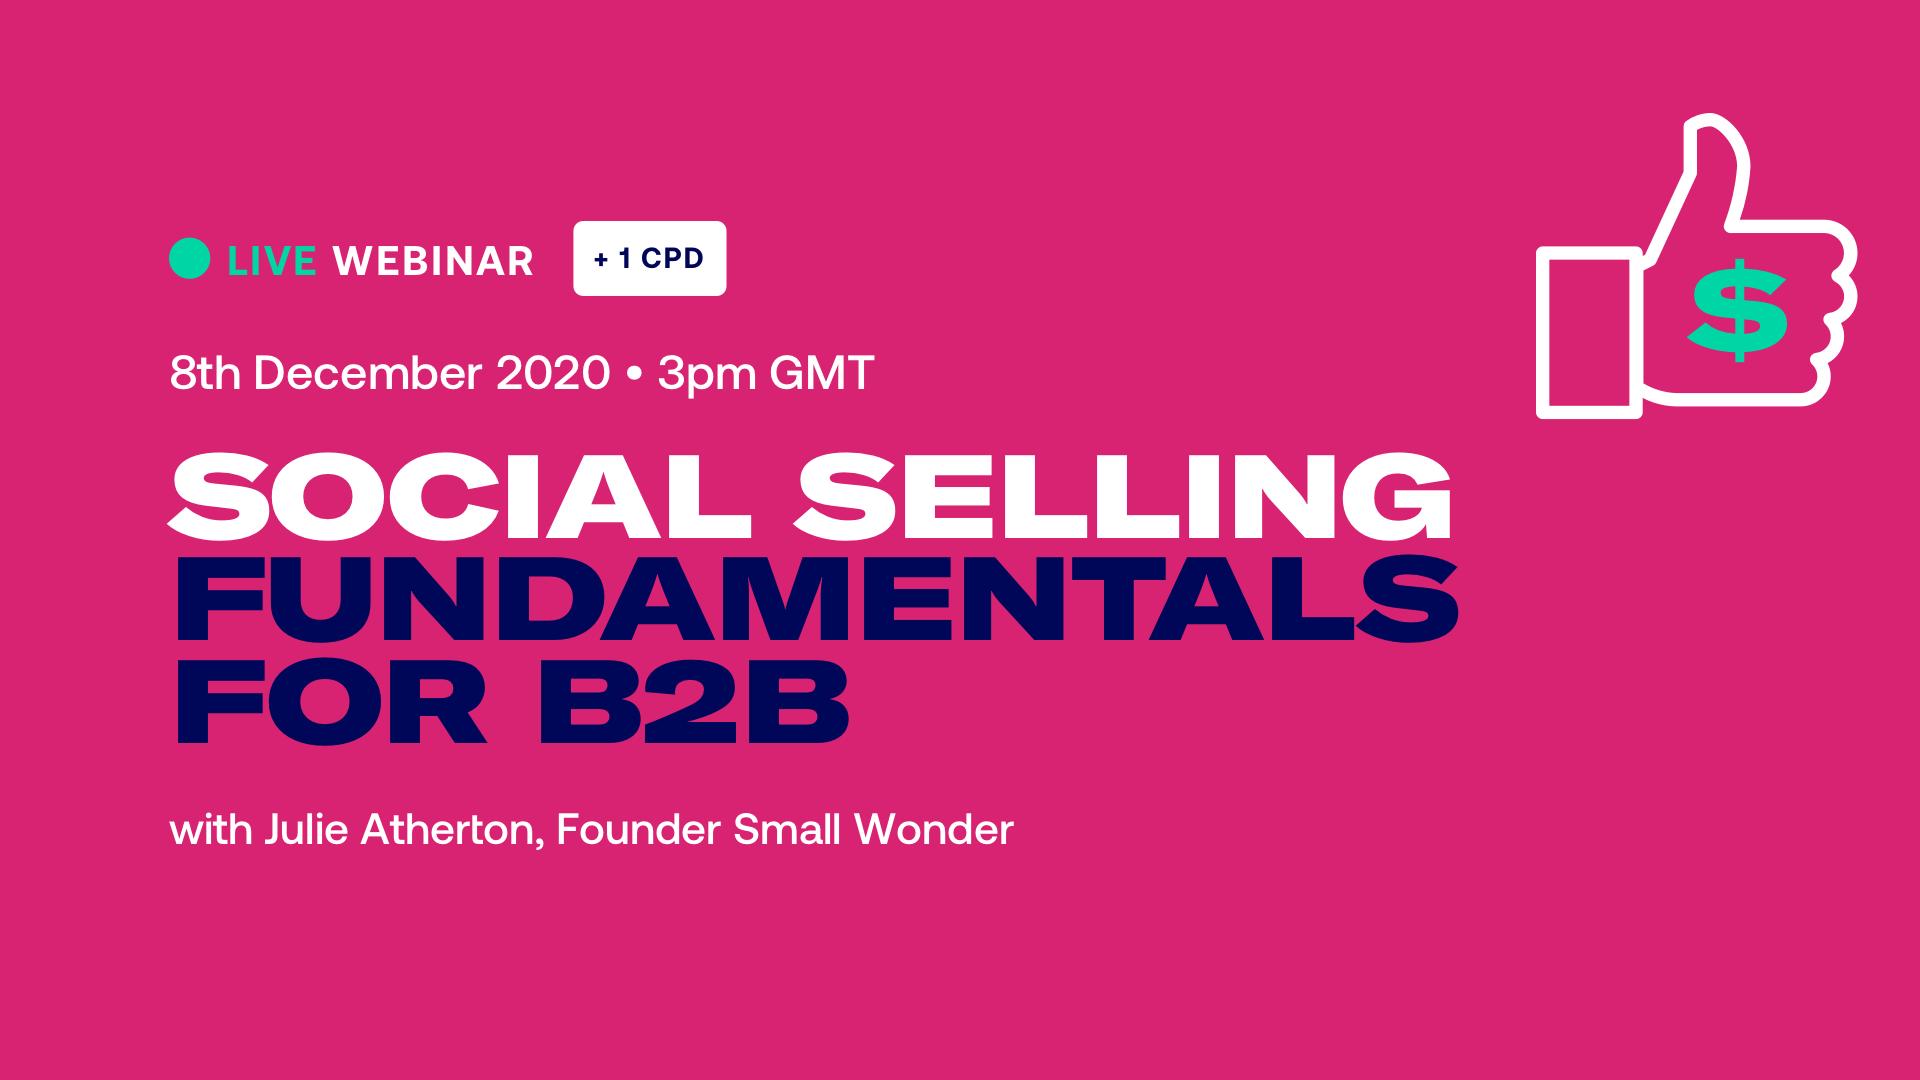 Social Selling Fundamentals for B2B